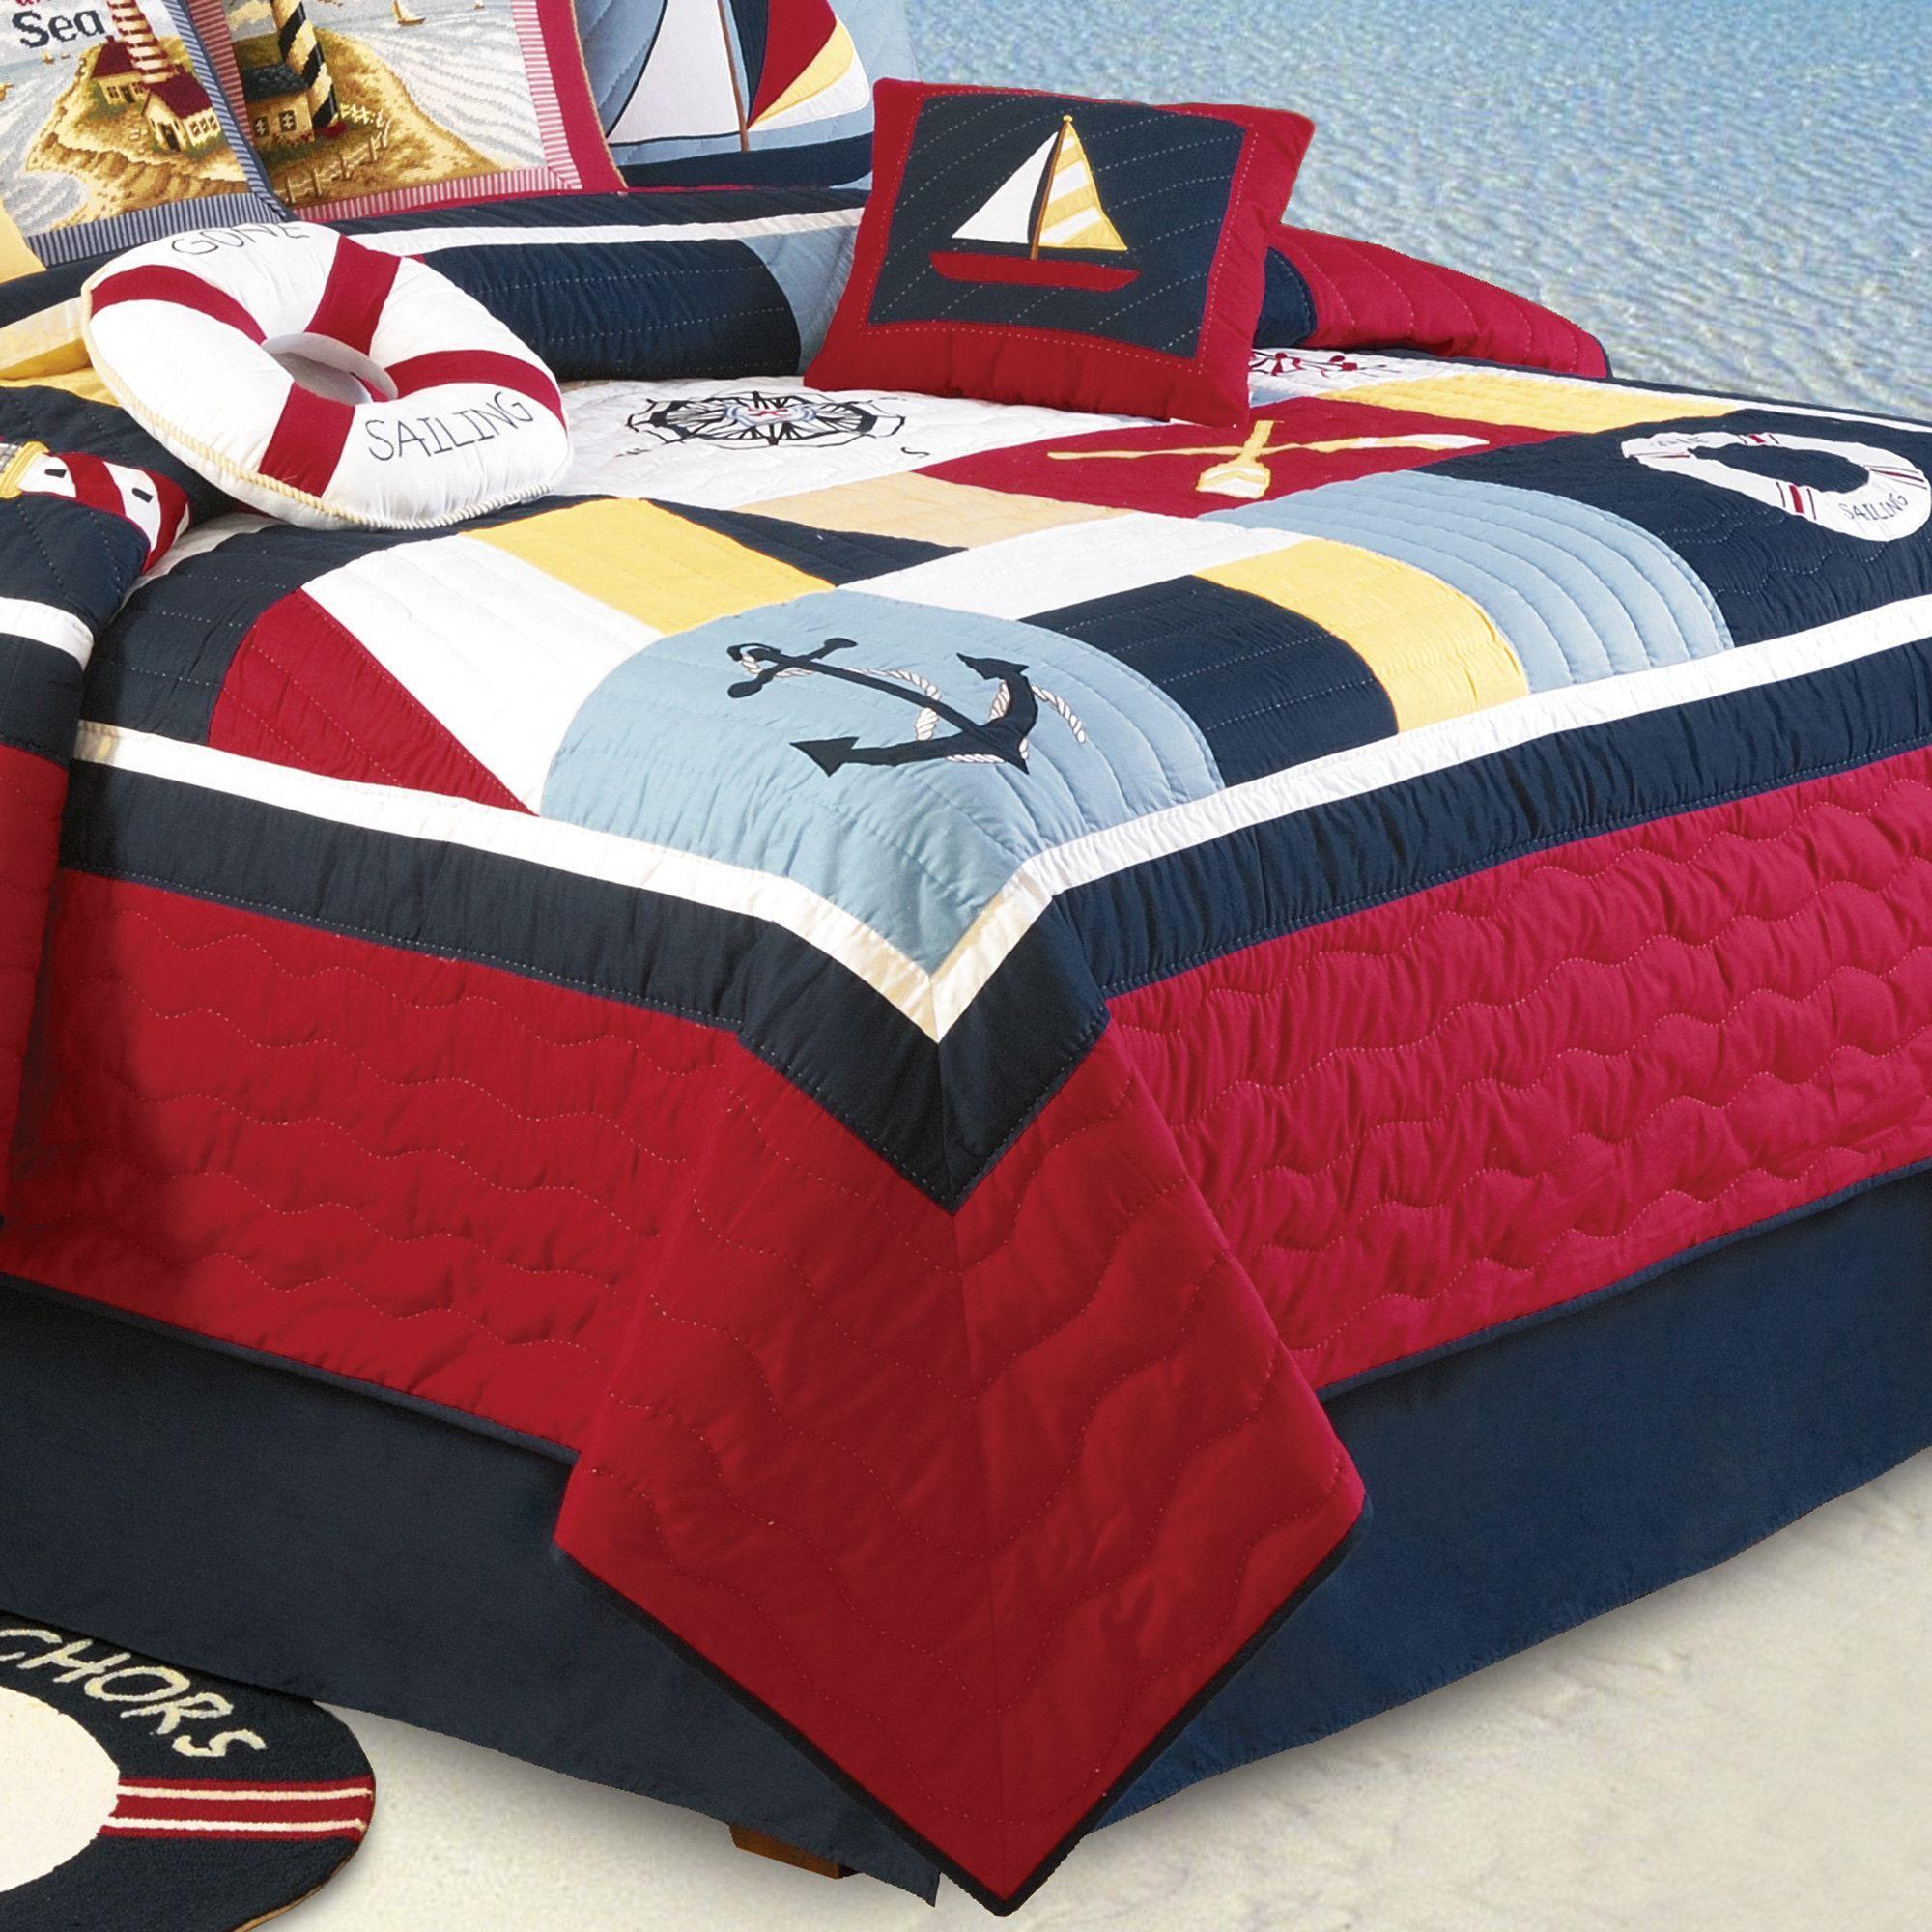 a super bed size king bag itm bedding in set red double single odette quilt